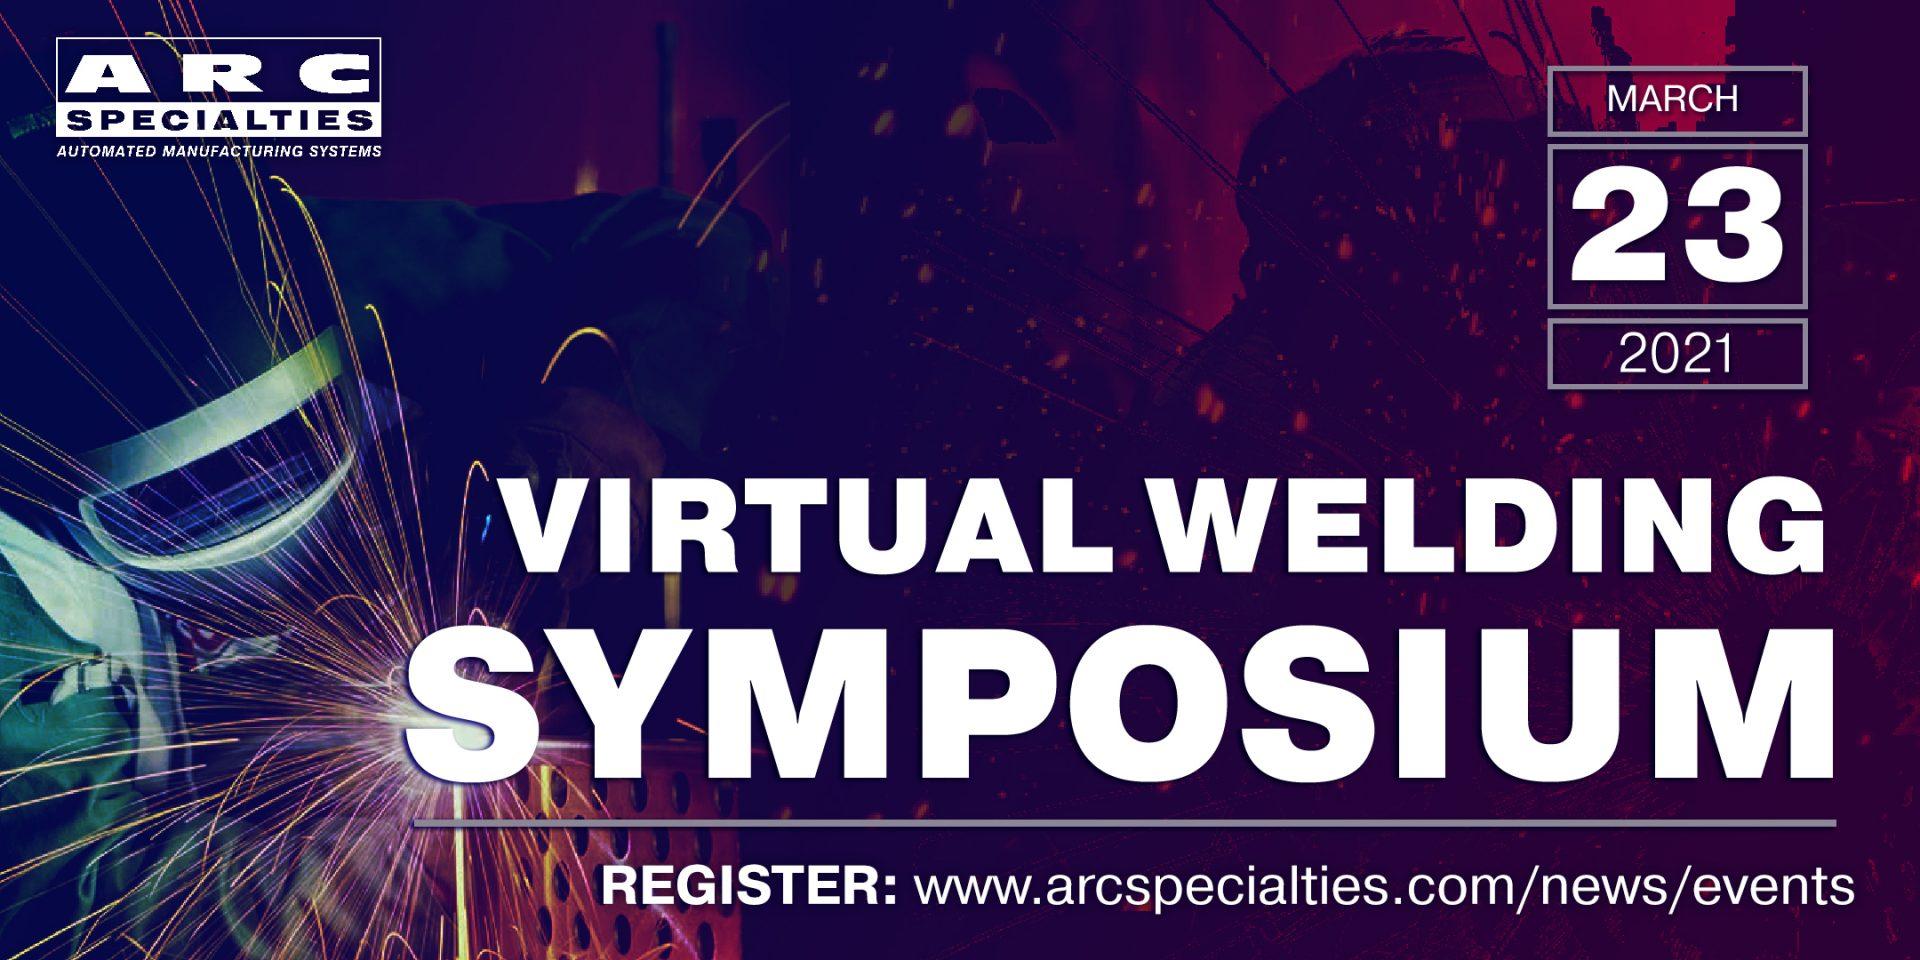 virtual welding symposium march 23, 2021